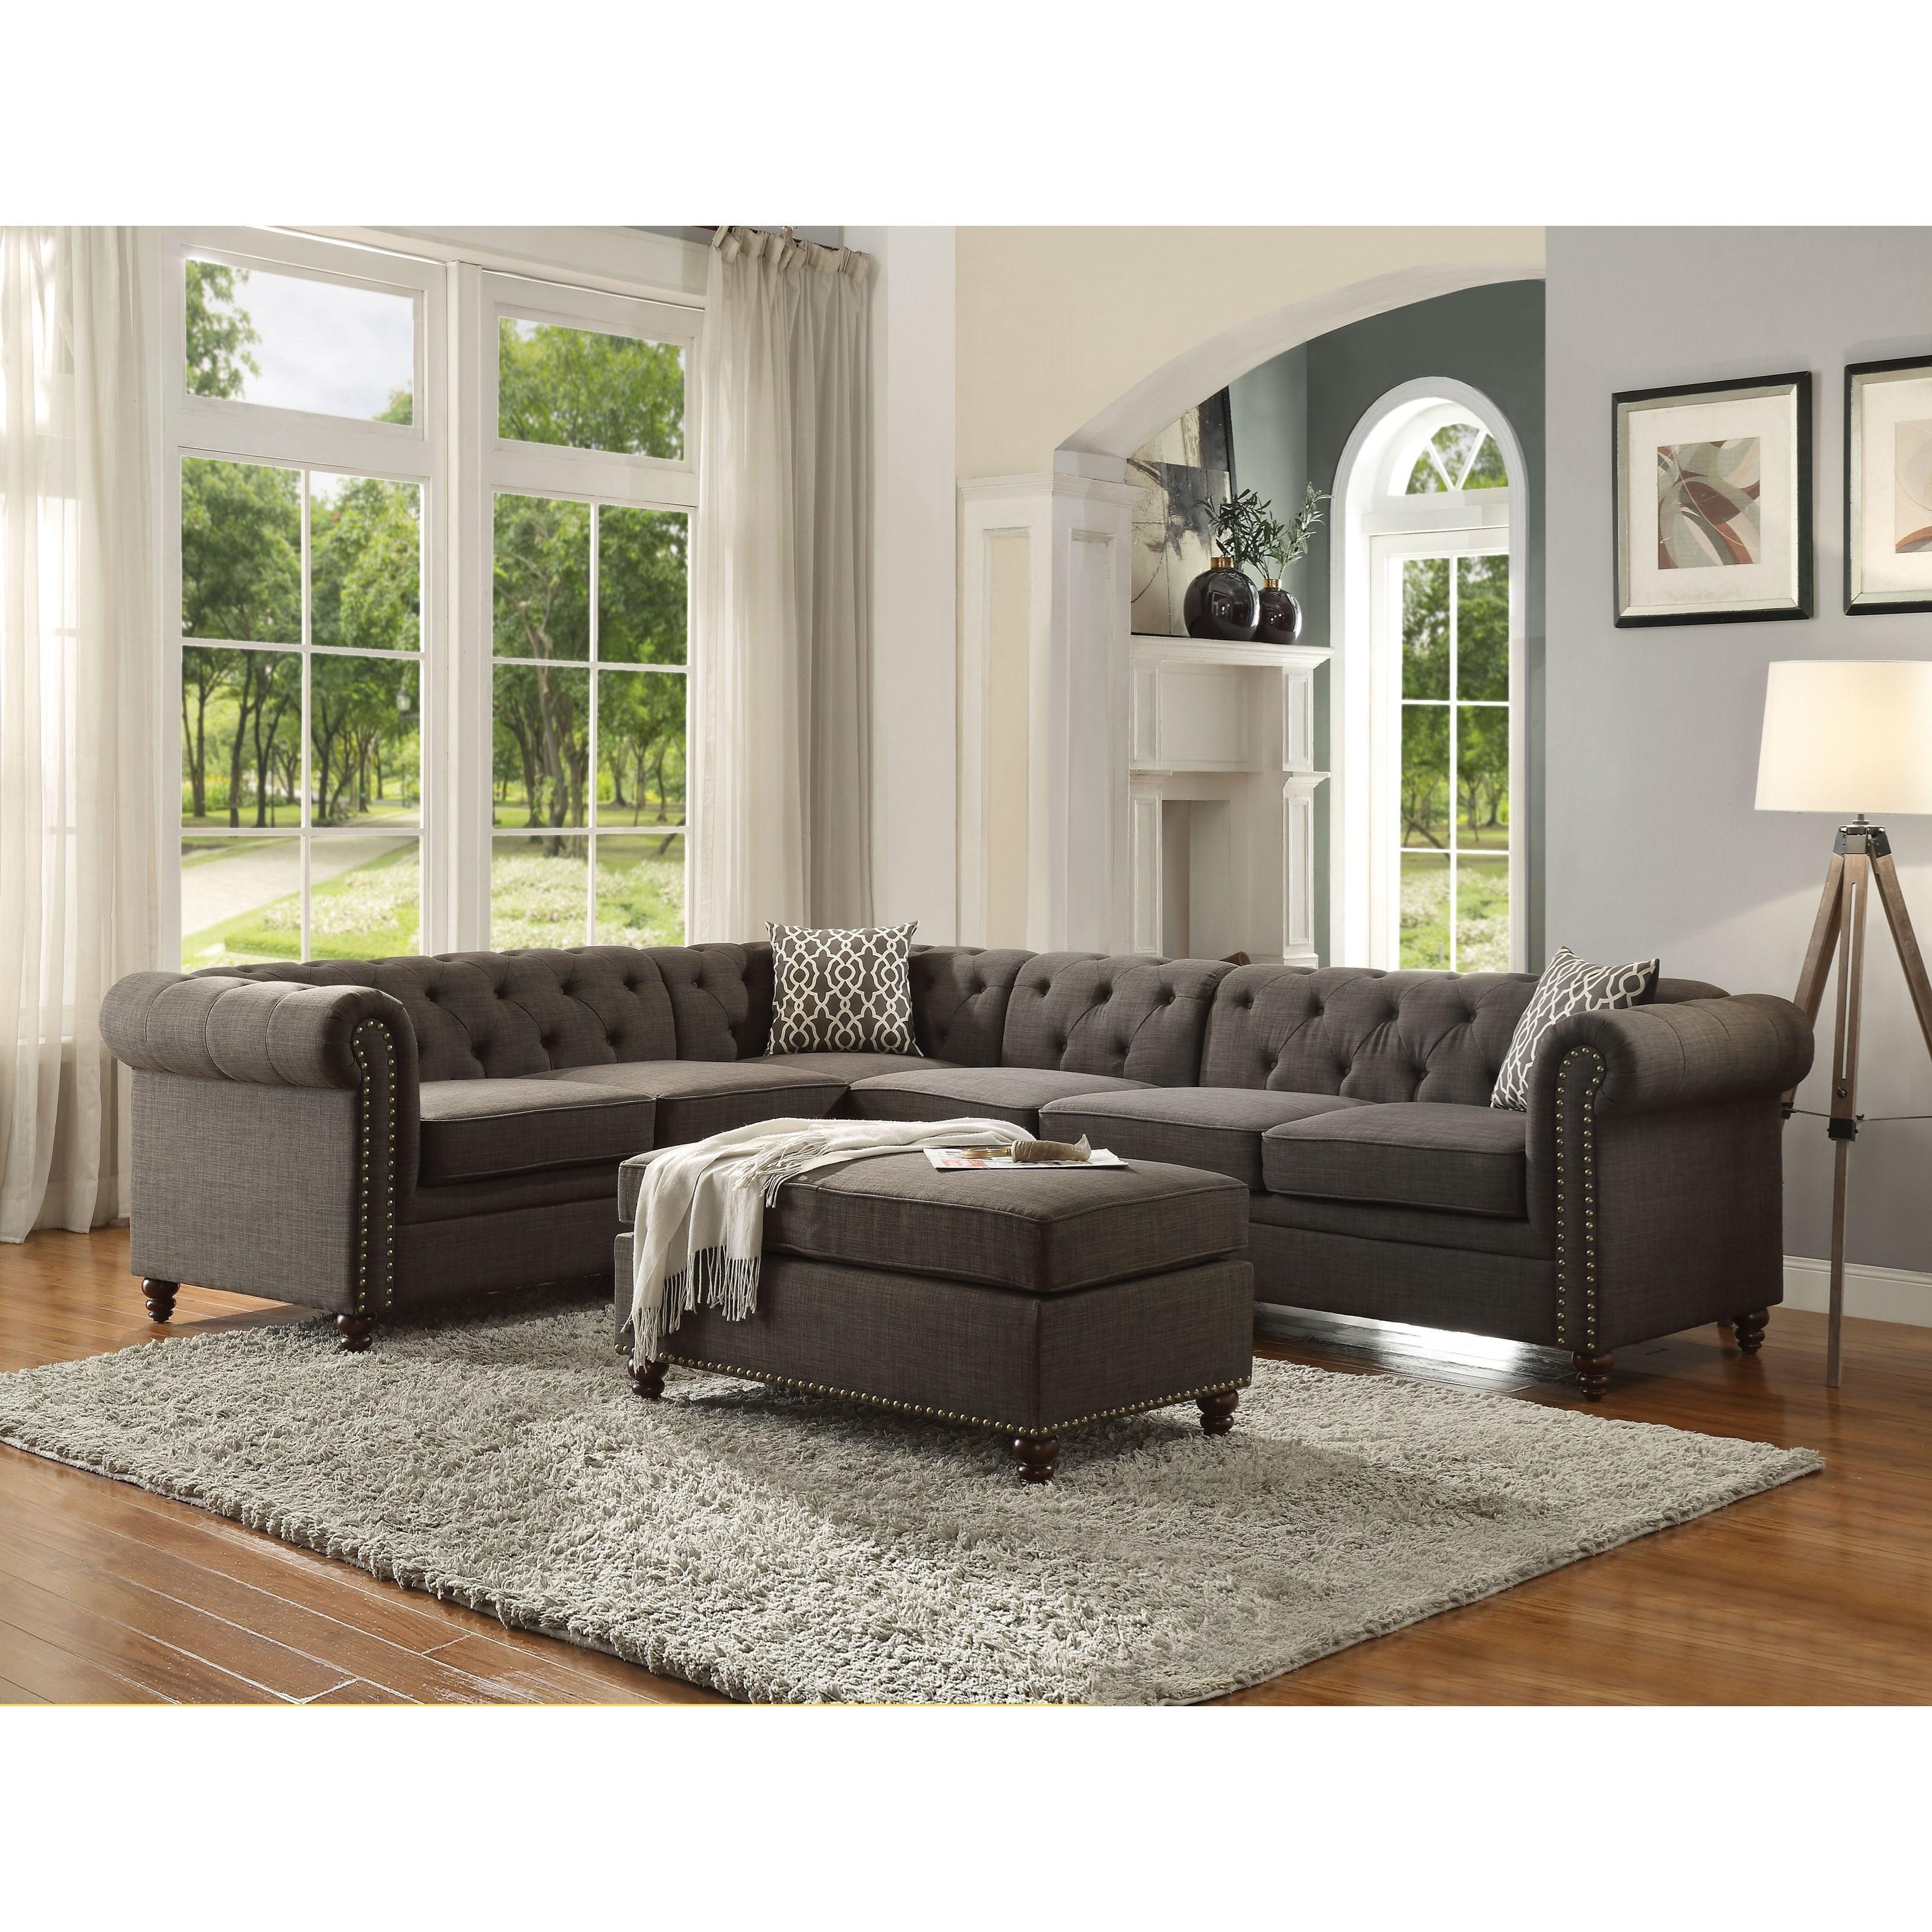 Aurelia II Sectional Sofa by Acme Furniture at Carolina Direct